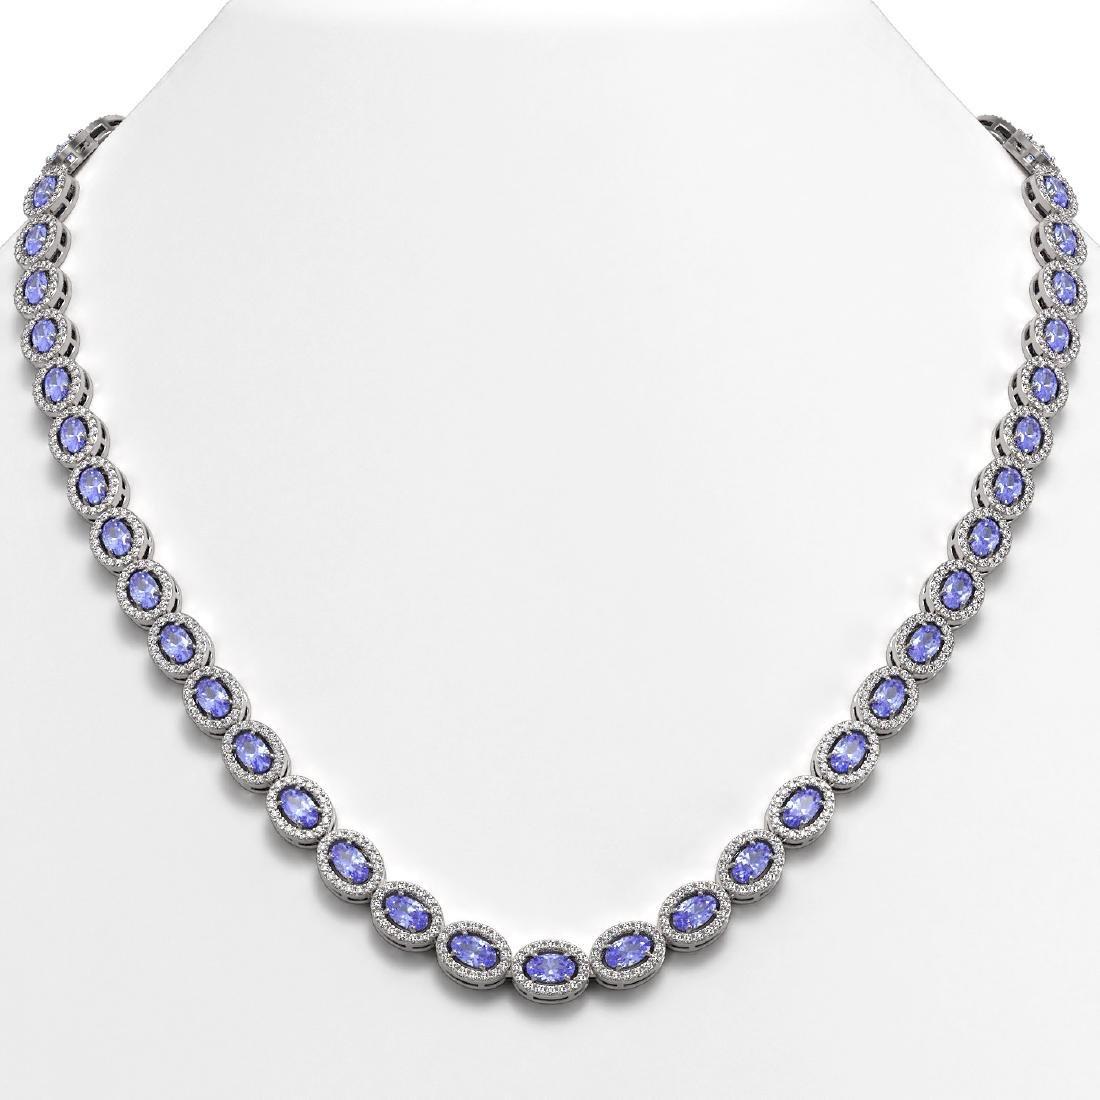 22.62 CTW Tanzanite & Diamond Halo Necklace 10K White